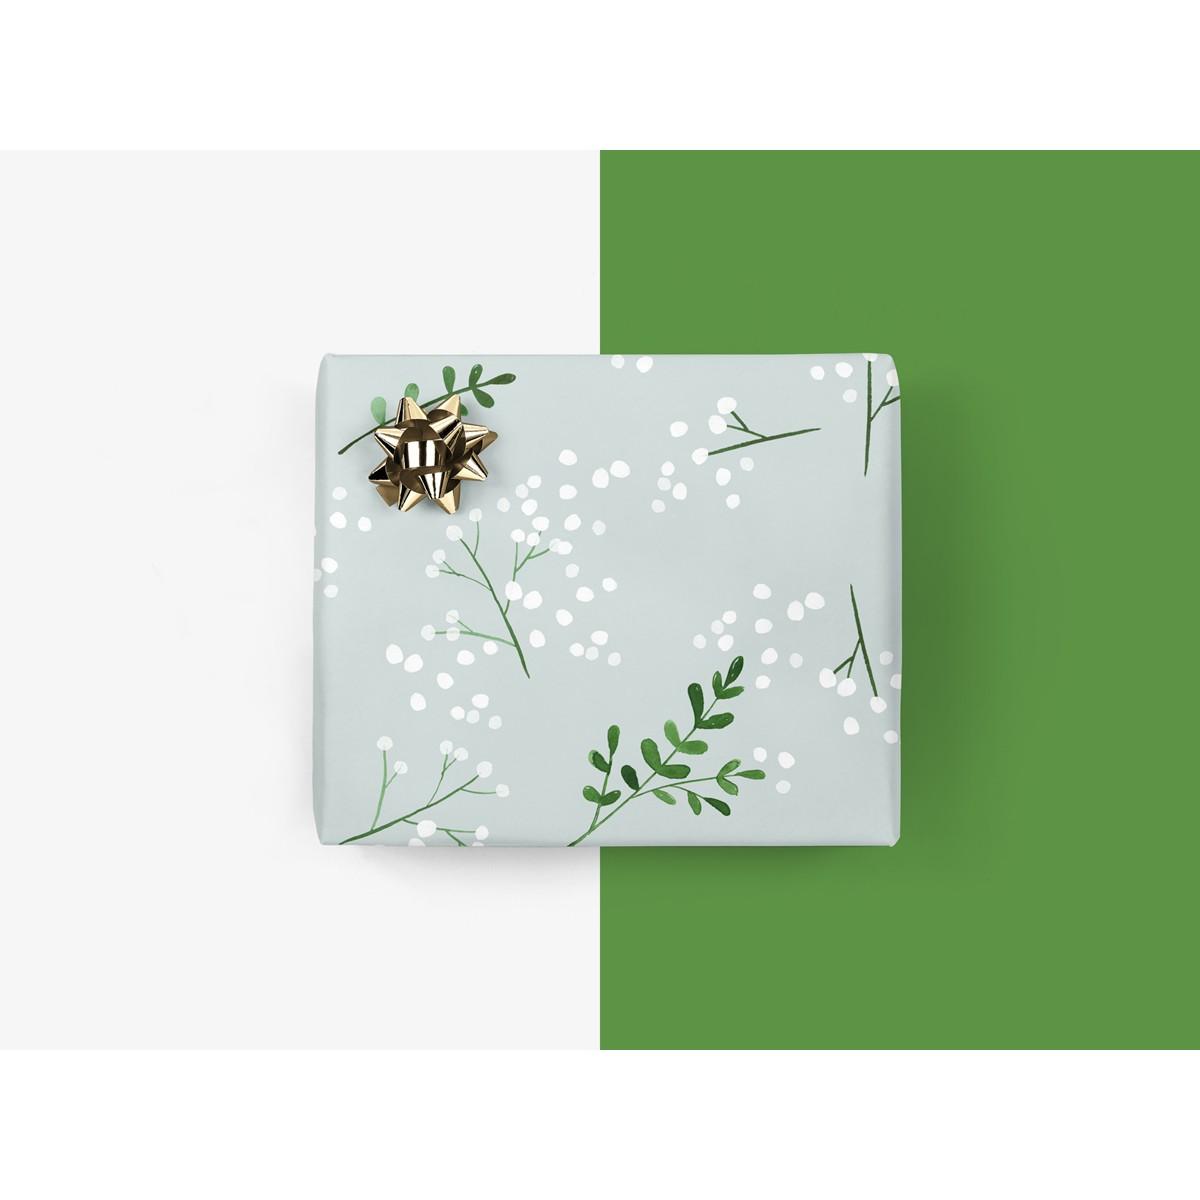 5x Geschenkpapier / Berries No. 2 (gefaltet)